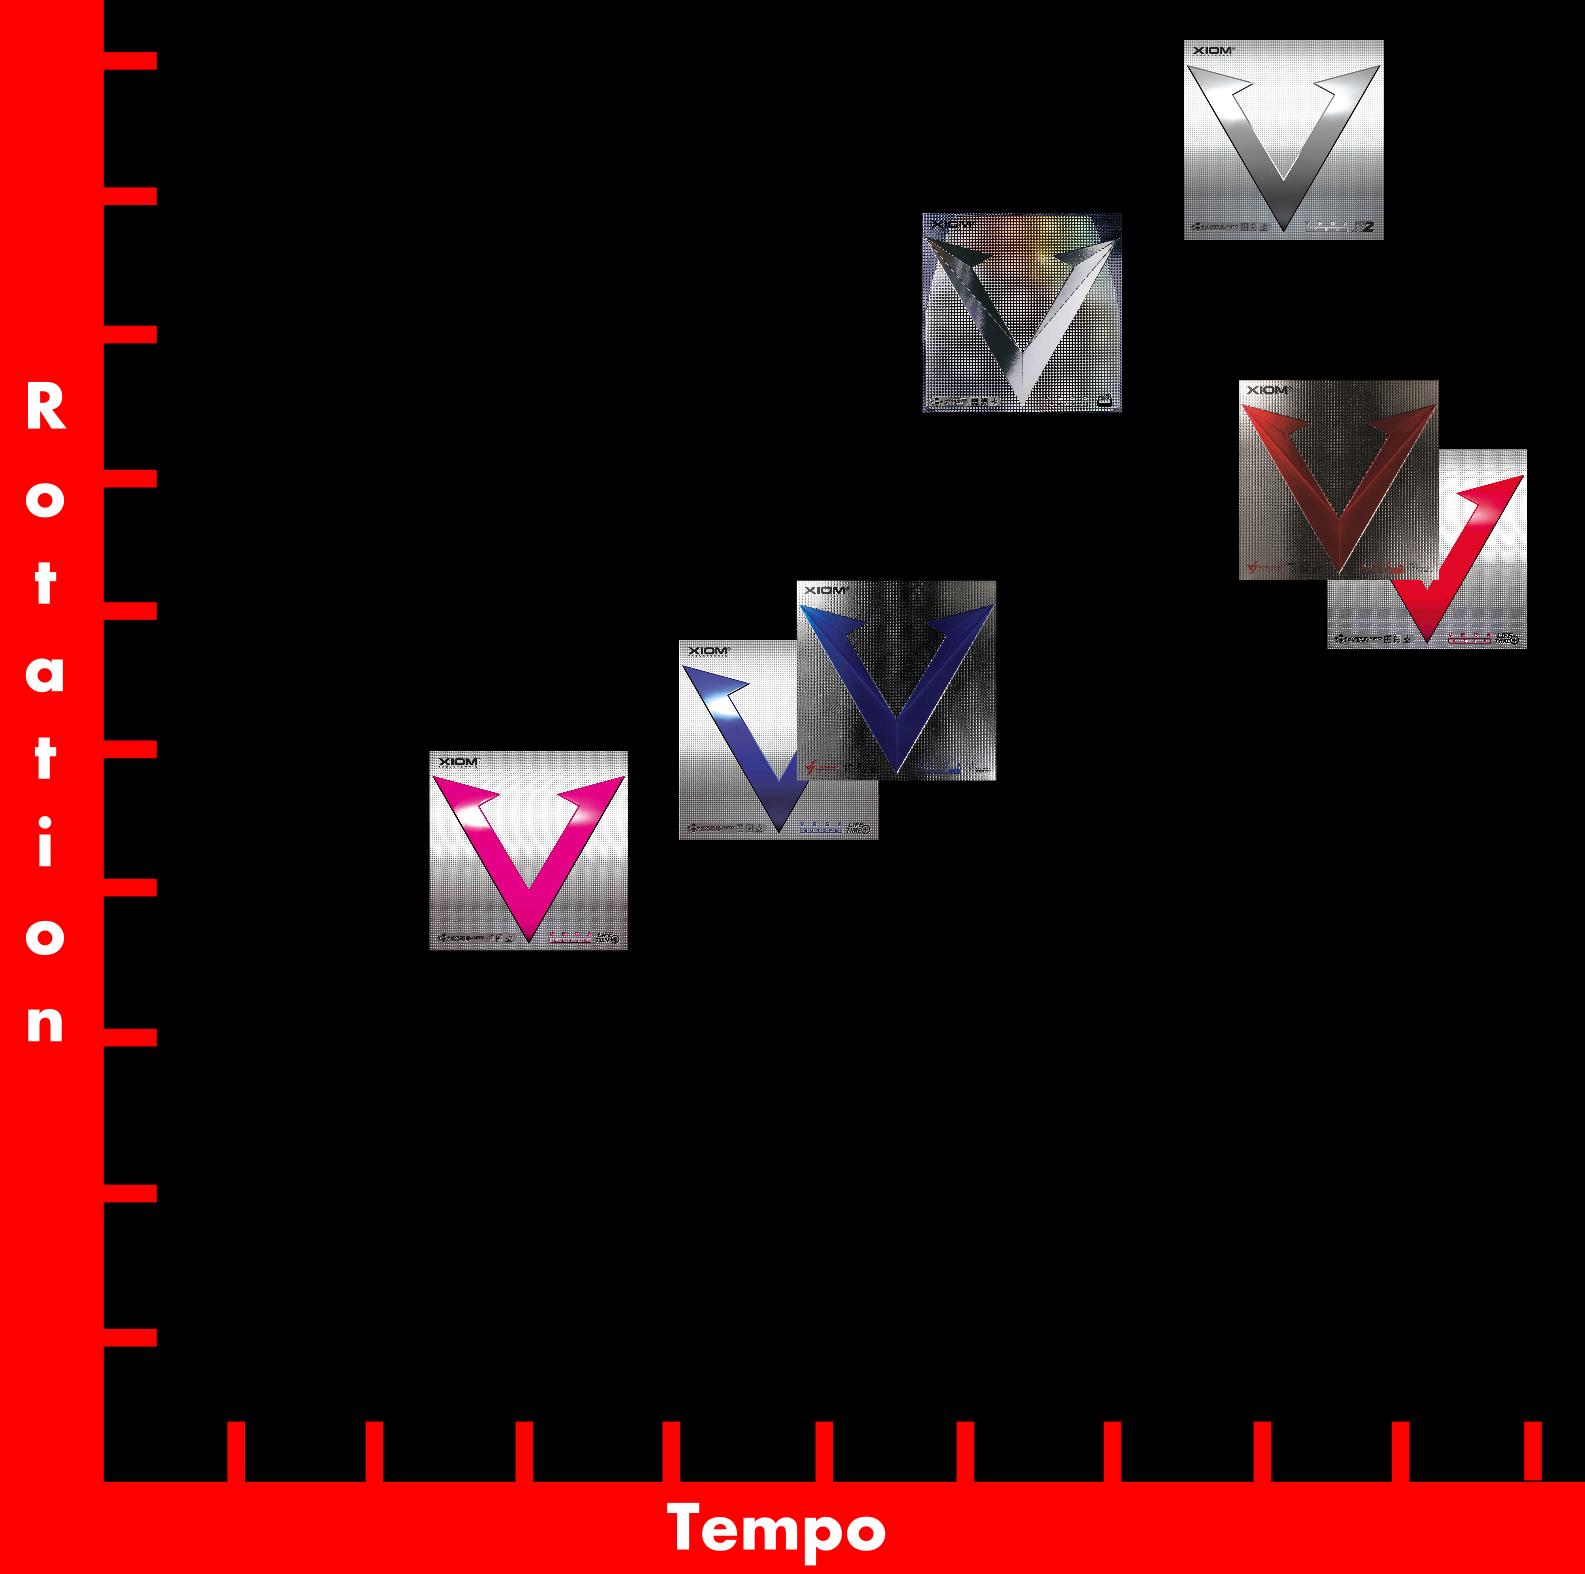 Xiom Vega Belagtest Tempo-Spin